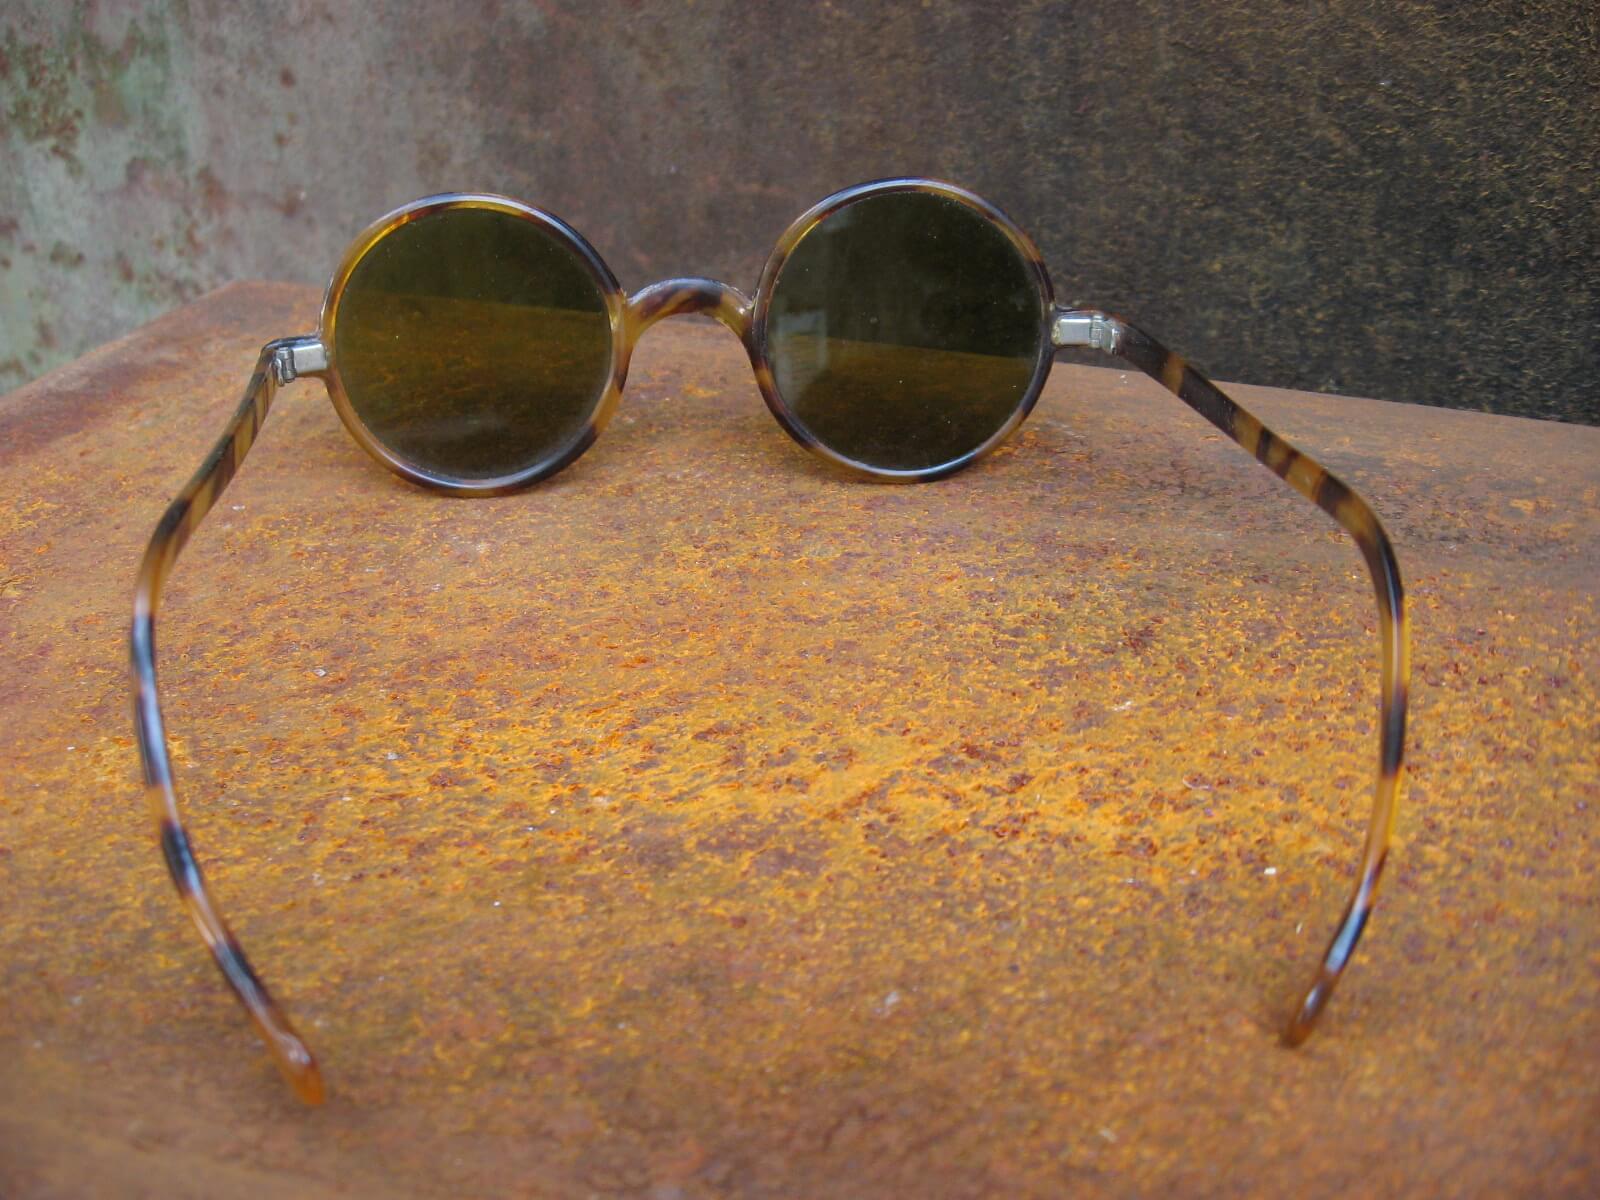 1920s bakelite tortoiseshell round sunglasses_C_PumpjackPiddlewick